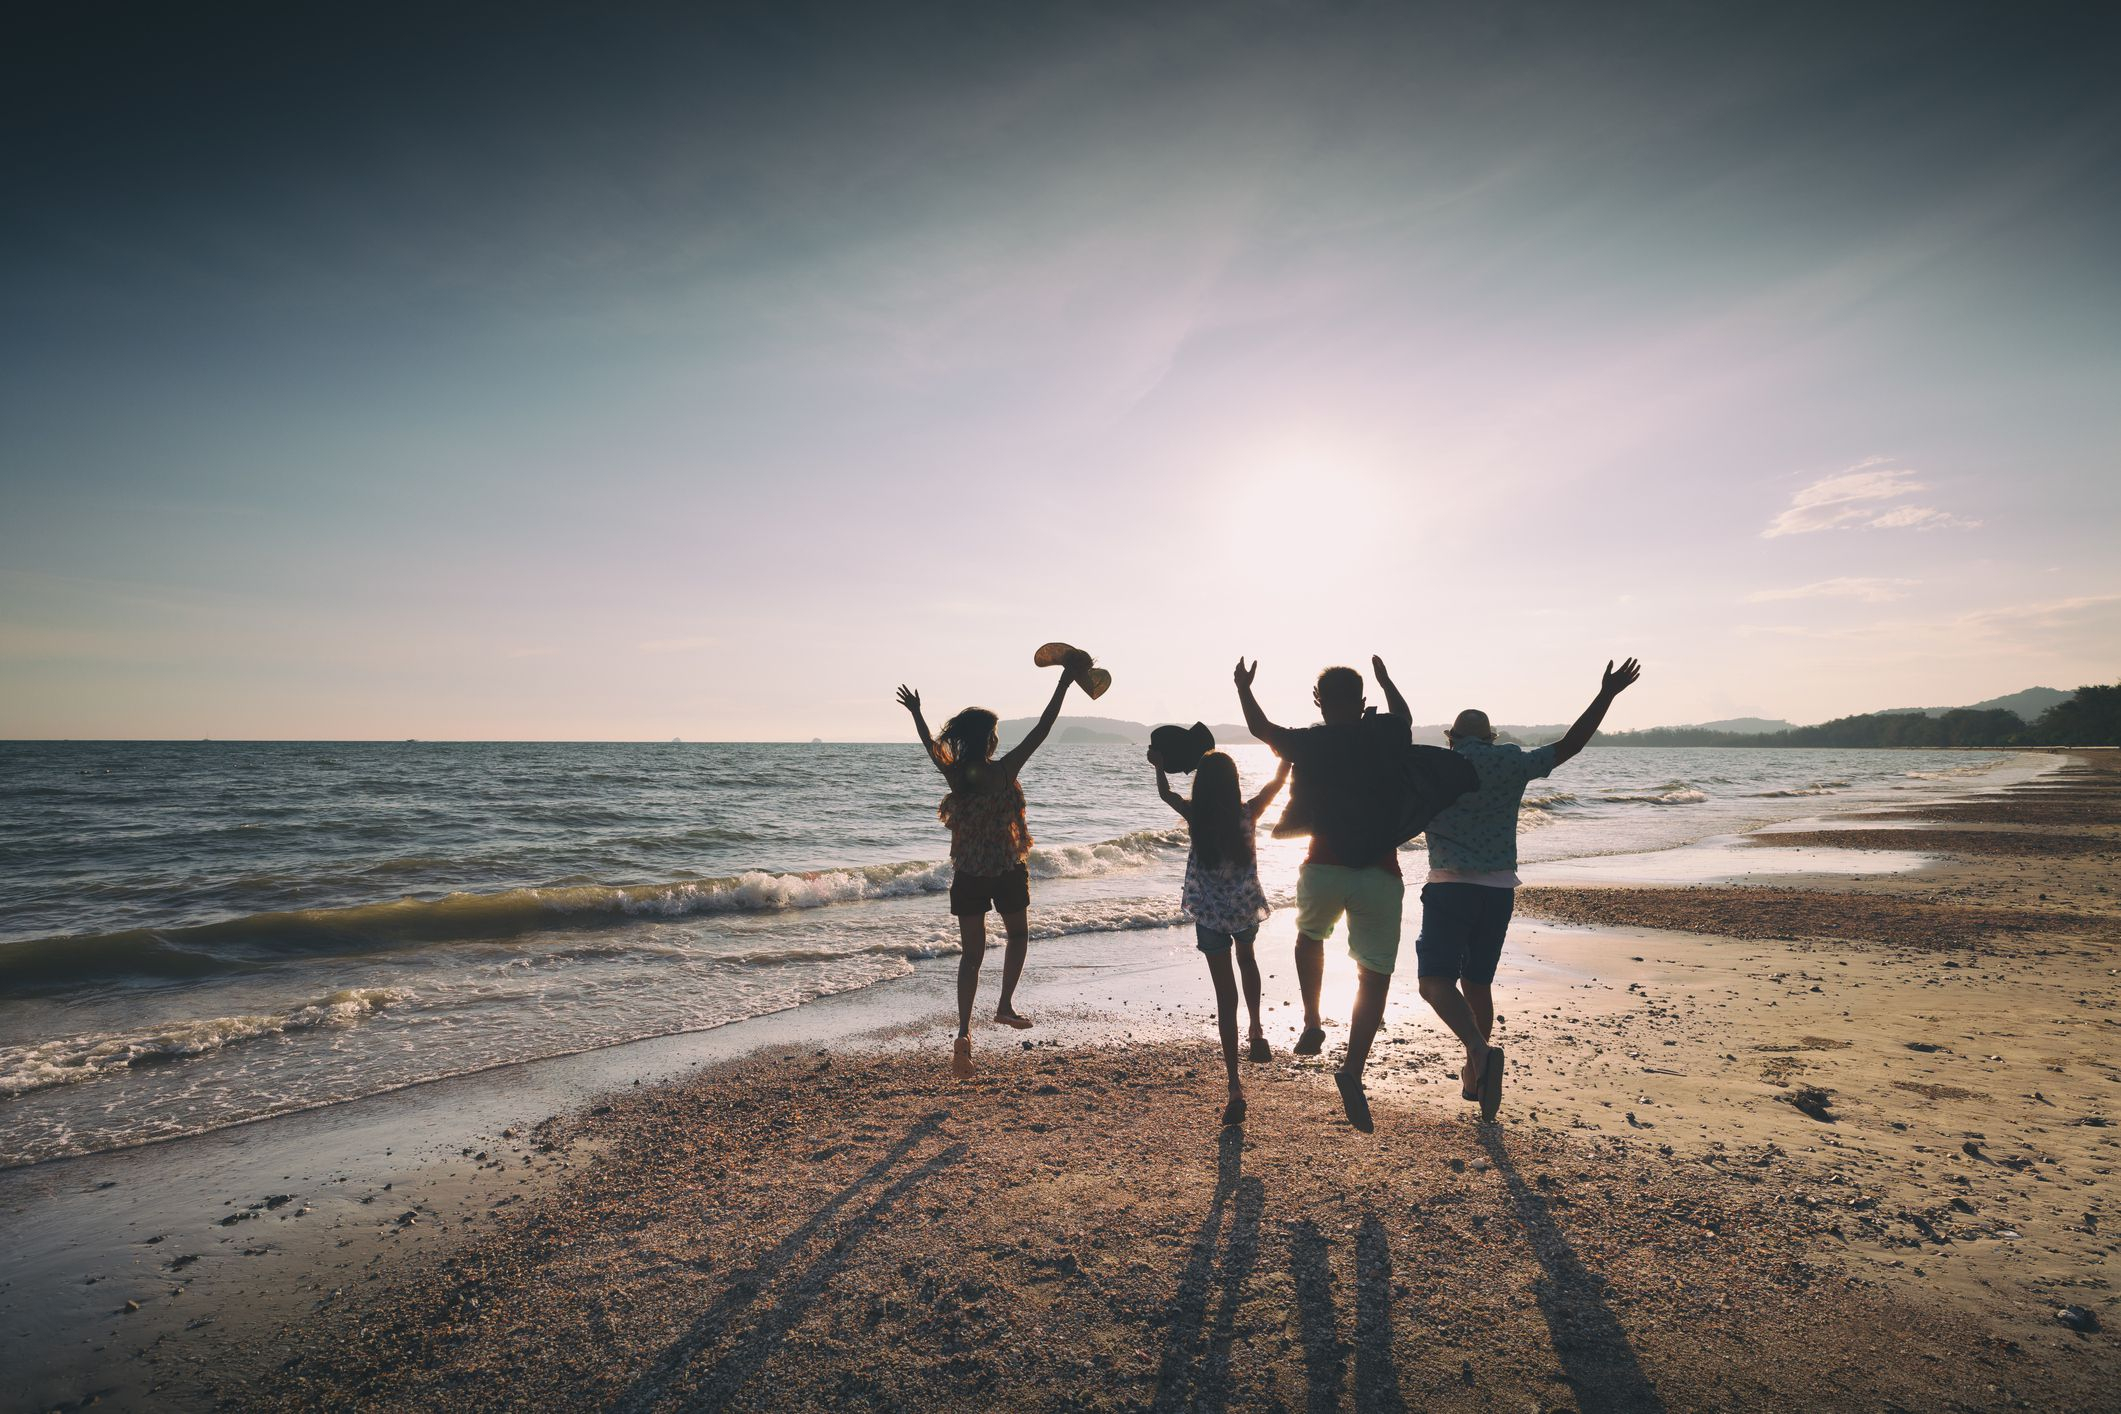 10 Fantastic Cheap Summer Vacation Ideas For Families 16 summer vacation ideas your whole family will love 2021